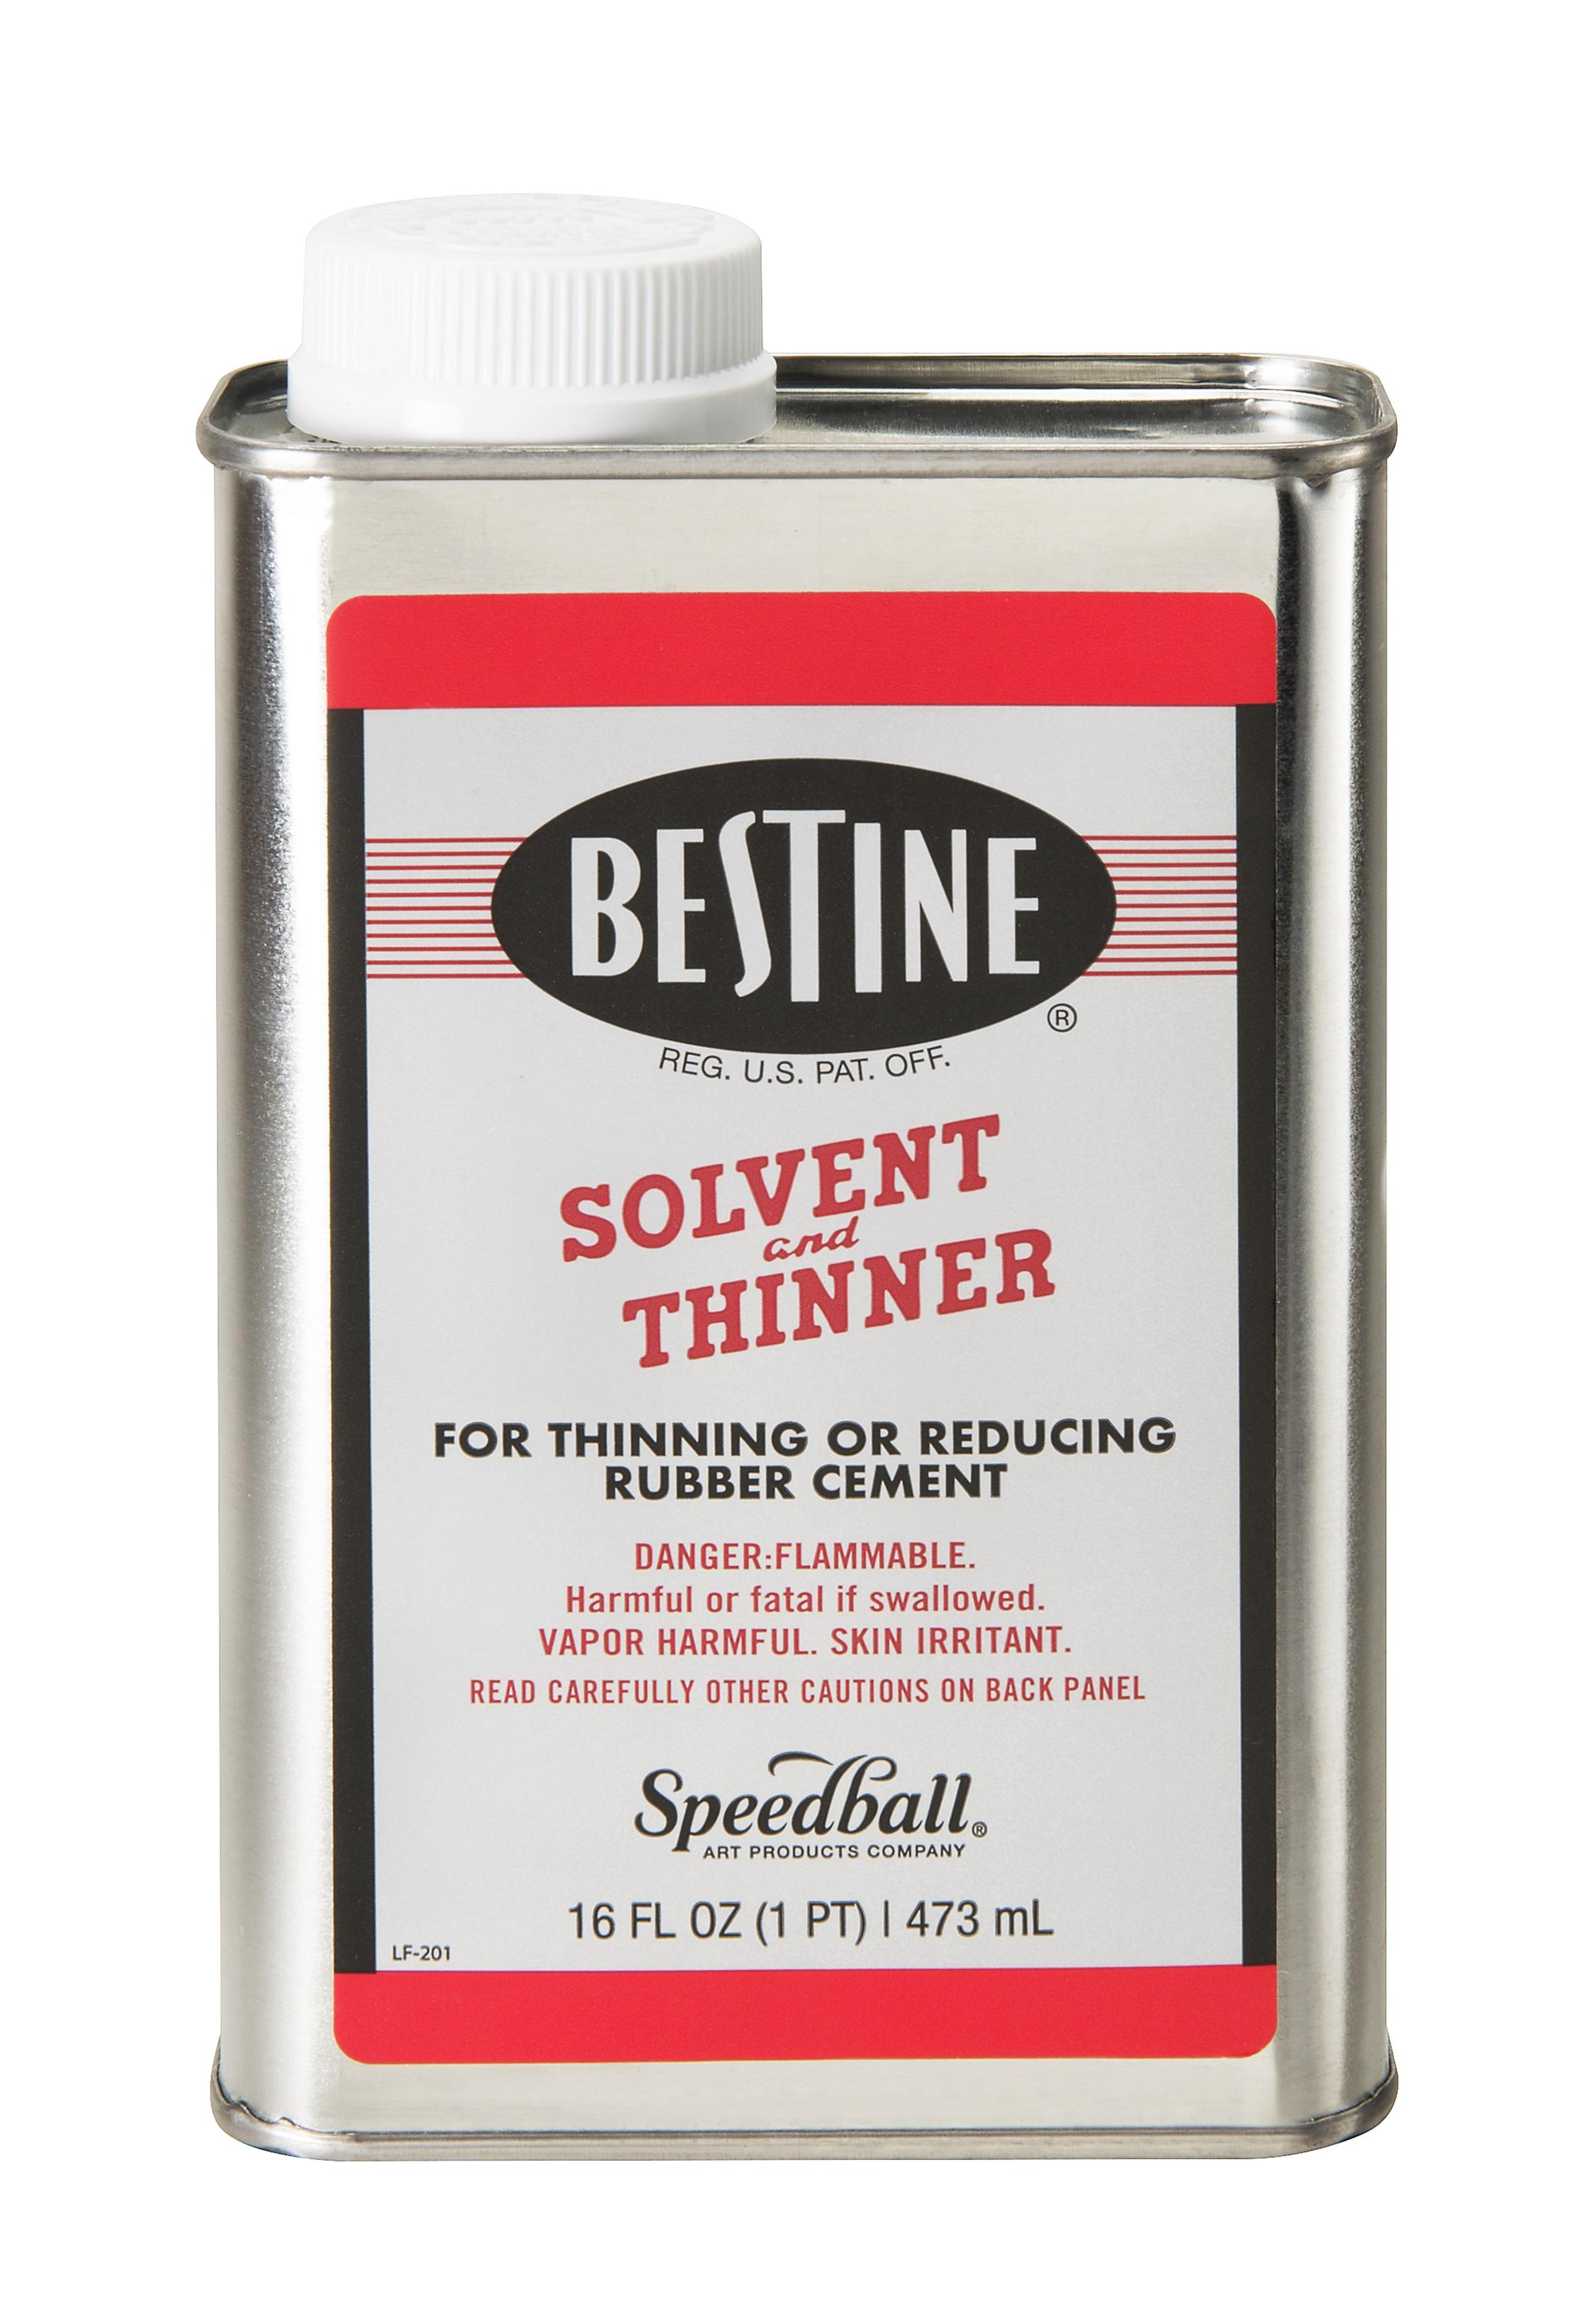 201 Bestine Solvent Pint